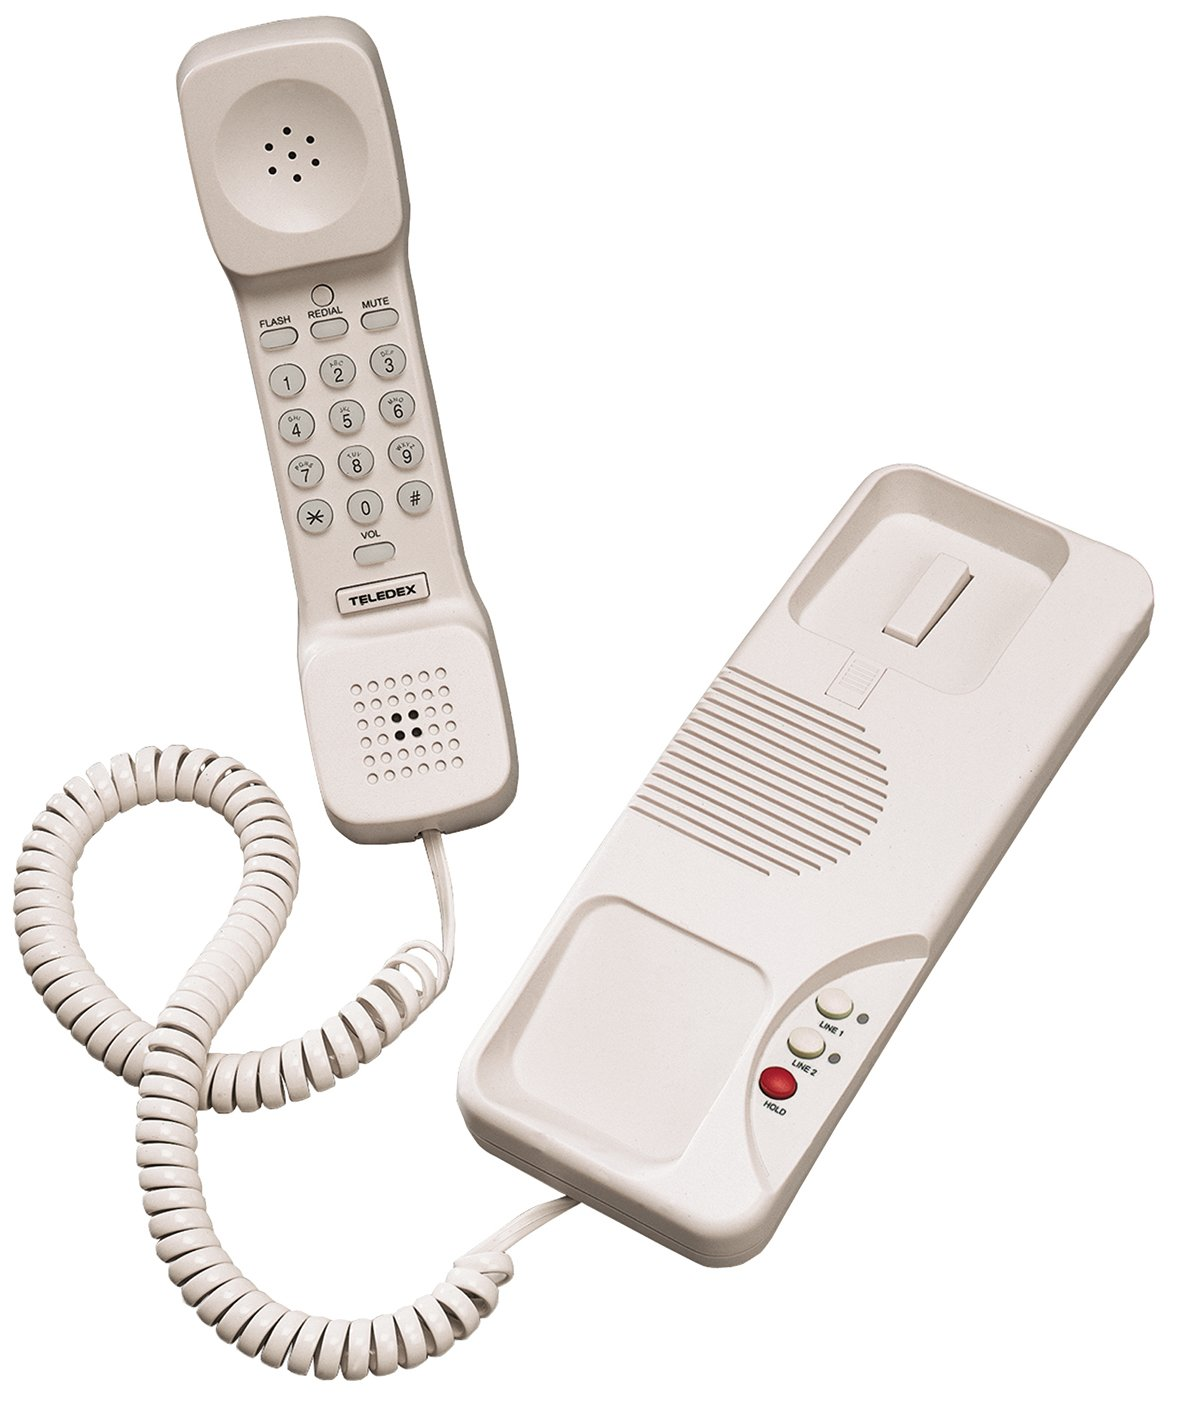 Teledex Opal Trimline 2 Ash